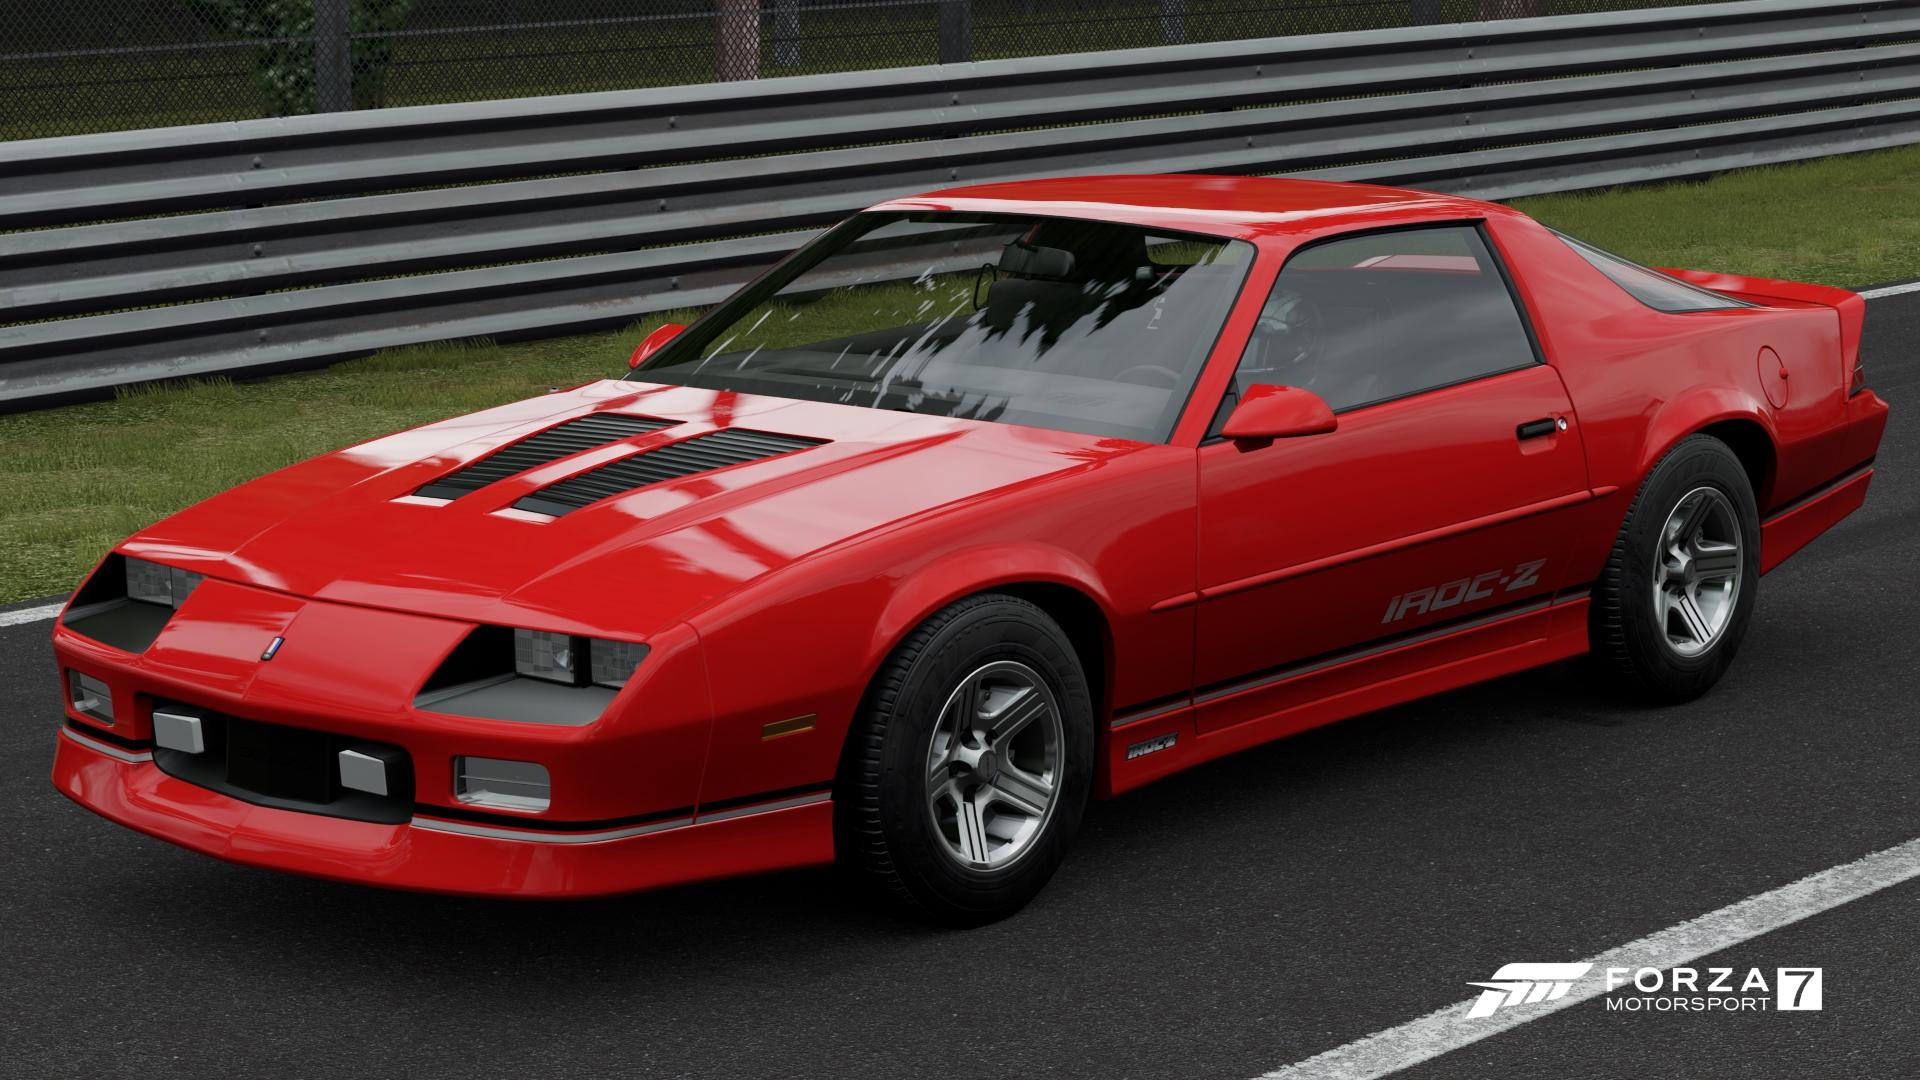 Forza Horizon 3 Car List >> Chevrolet Camaro IROC-Z | Forza Motorsport Wiki | FANDOM ...